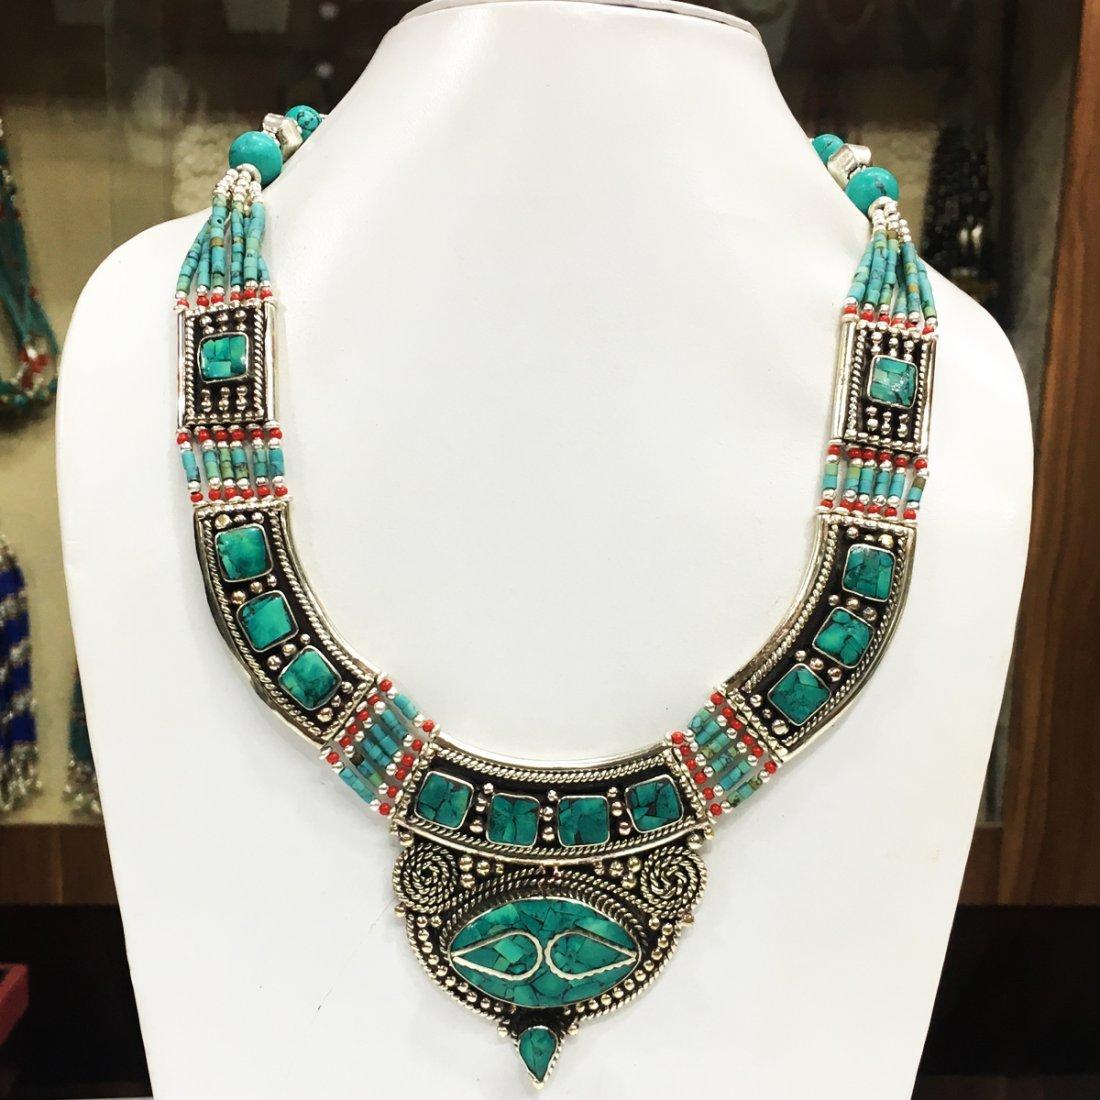 Buddhist Turquoise & Handmade Vintage Necklace